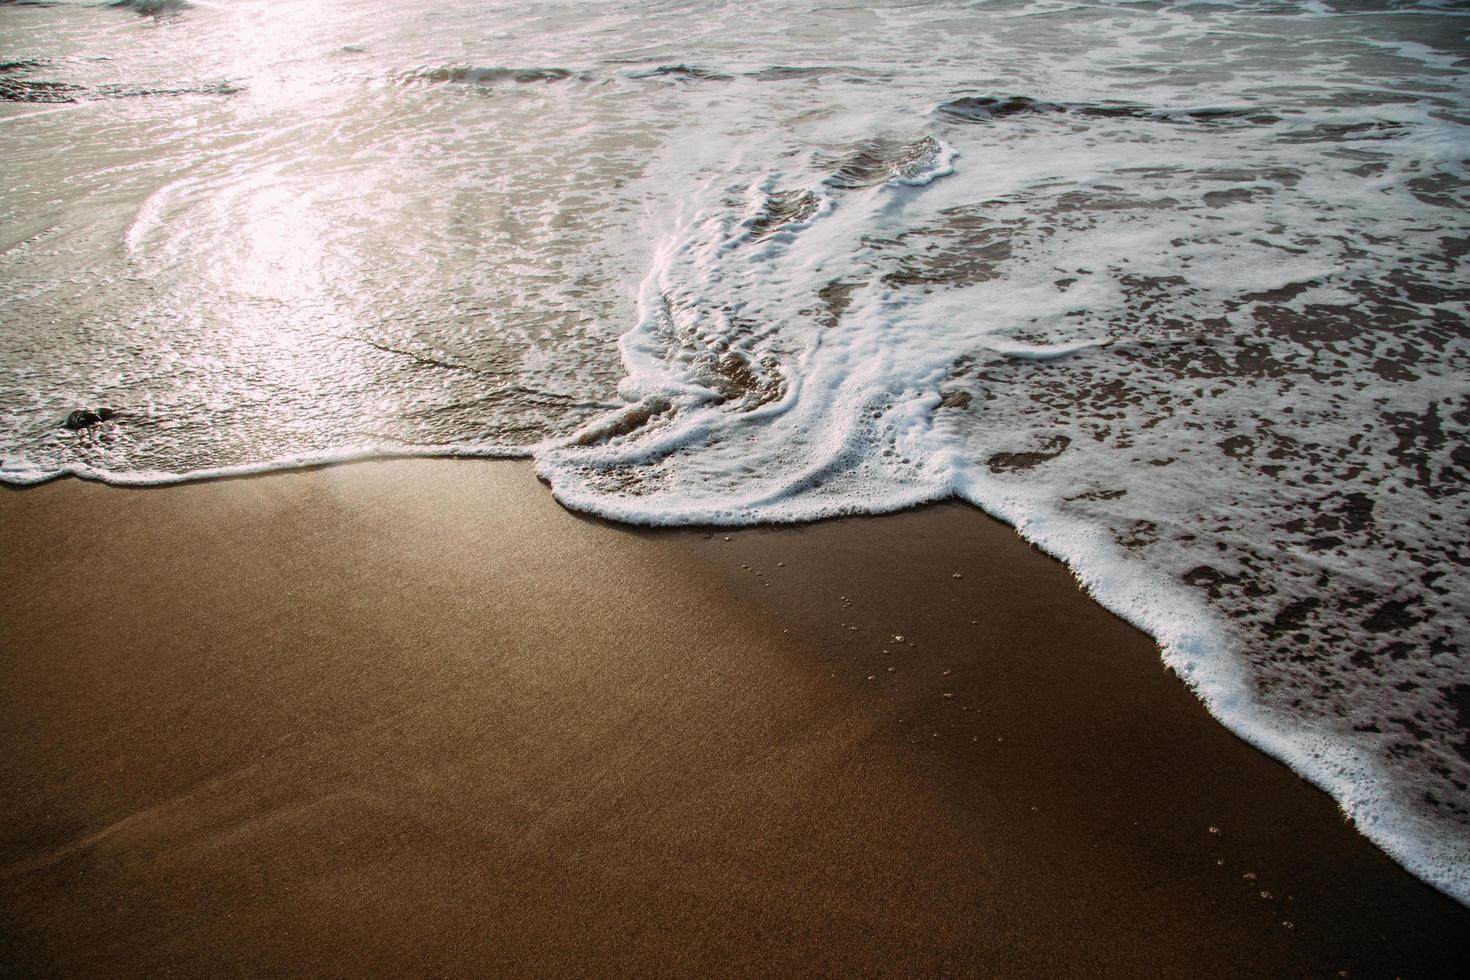 schimmernde Wellen am Strand foto